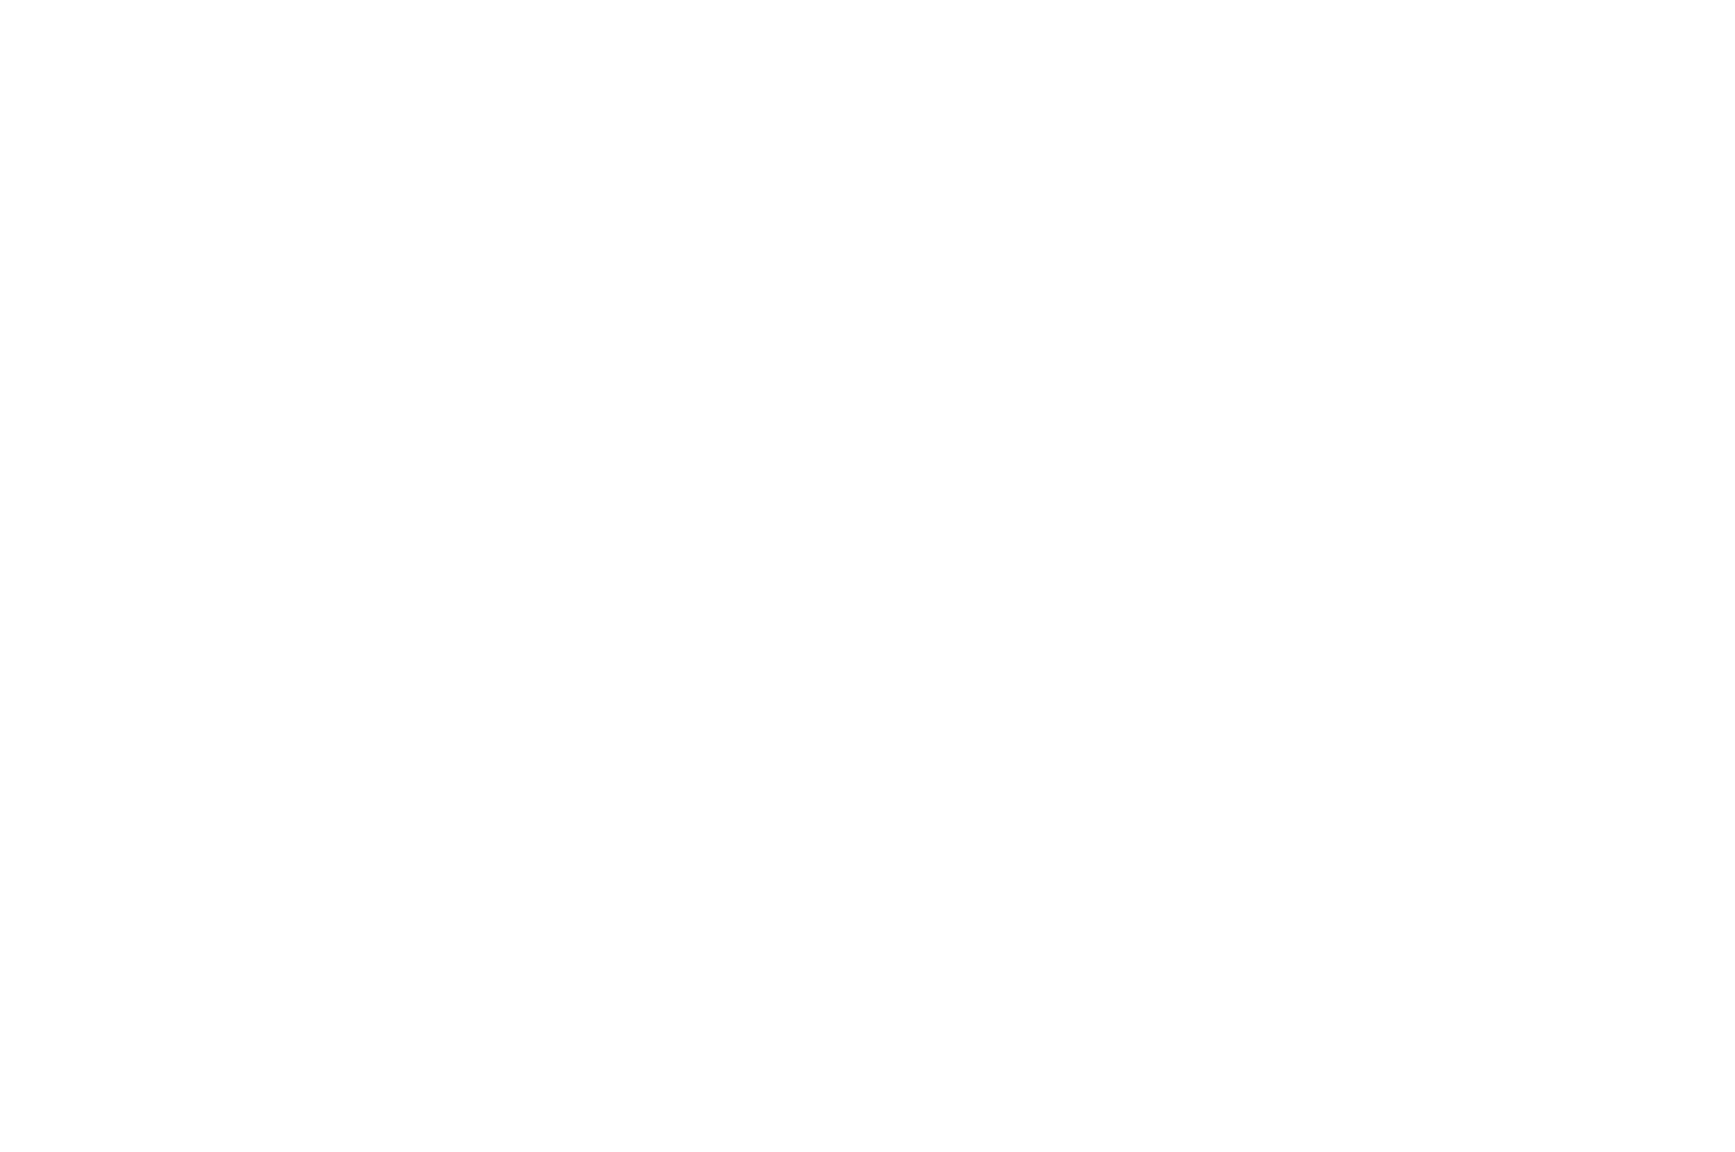 WINNER - Indie Short Fest - 2020